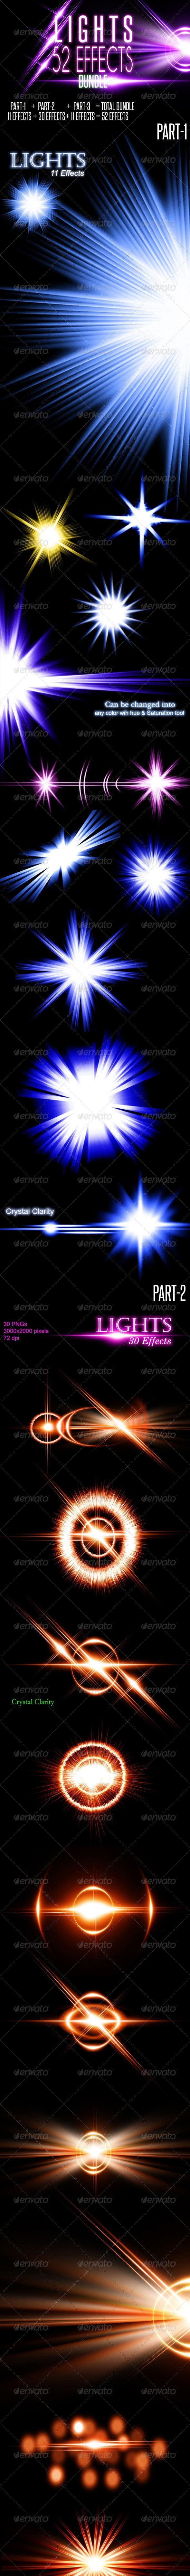 52 Lens Flares with Light Effects ( Bundle) - Flourishes / Swirls Decorative